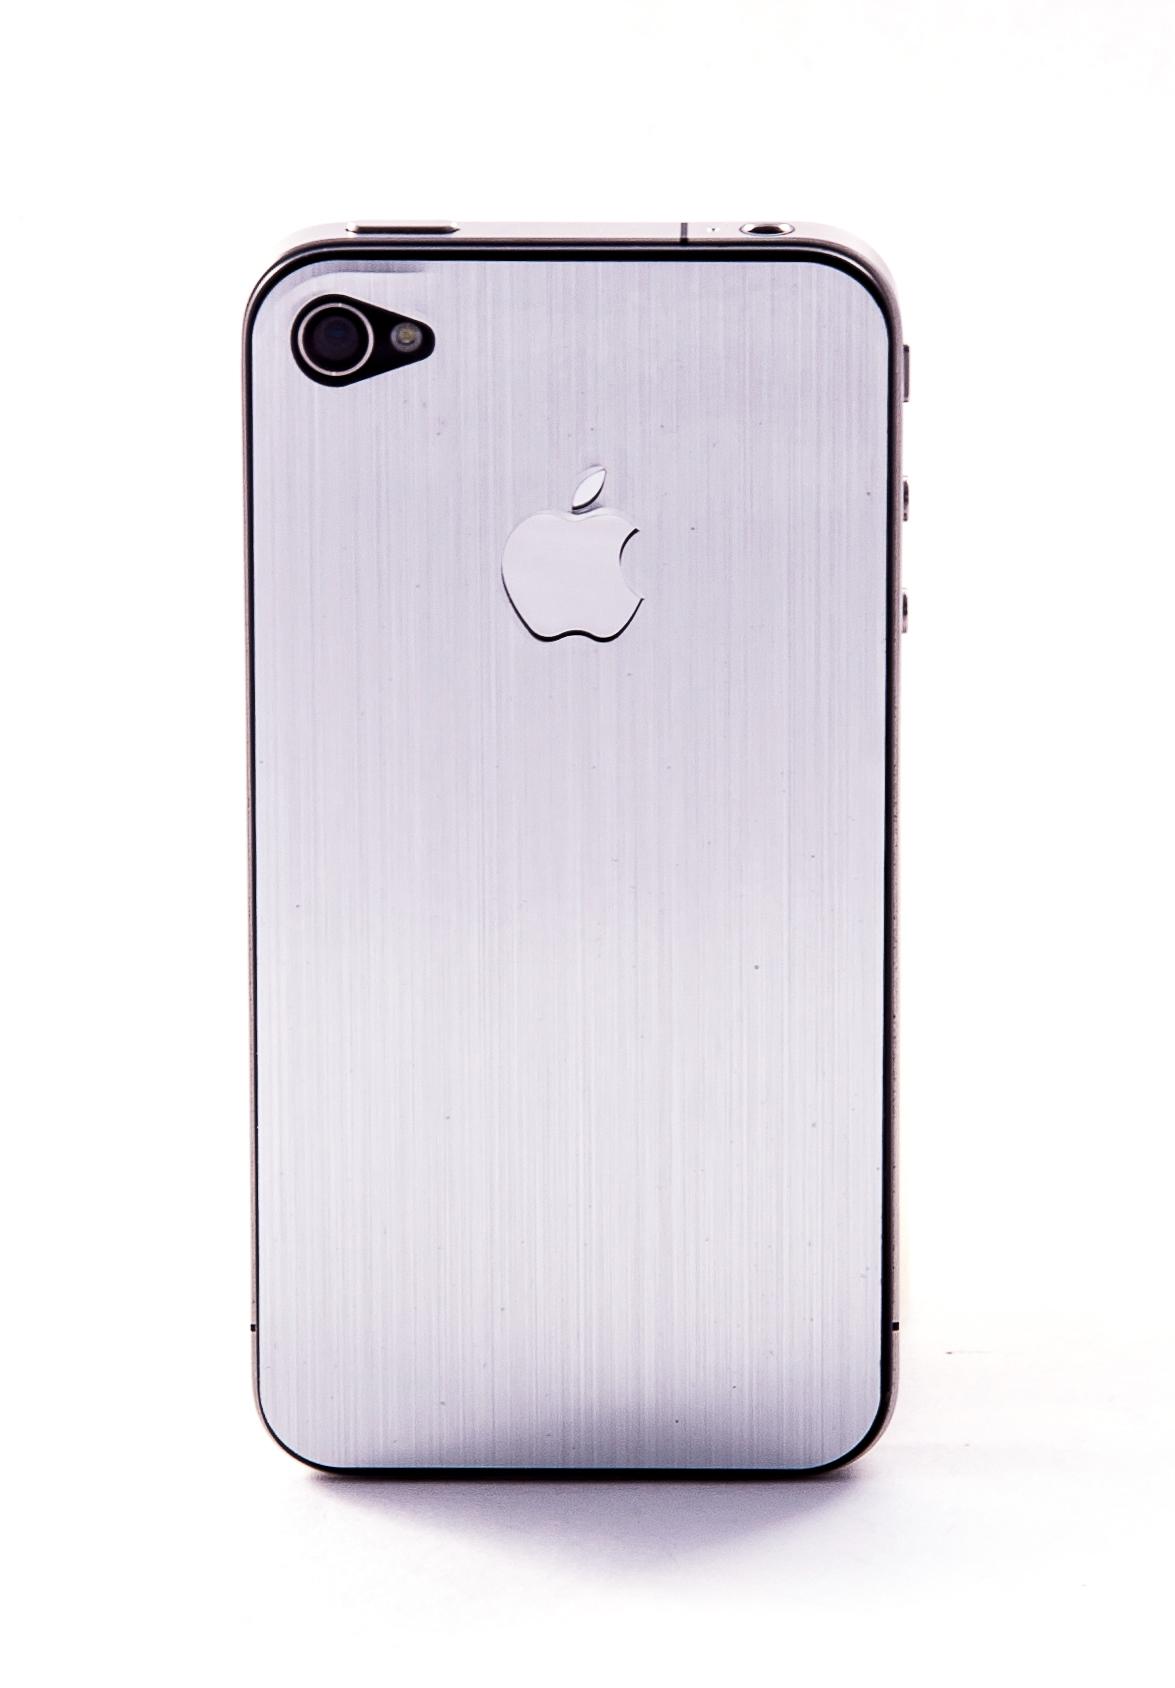 Пленка защитная EGGO iPhone 4/4S Crystalcover silver BackSide (серый, металлик)